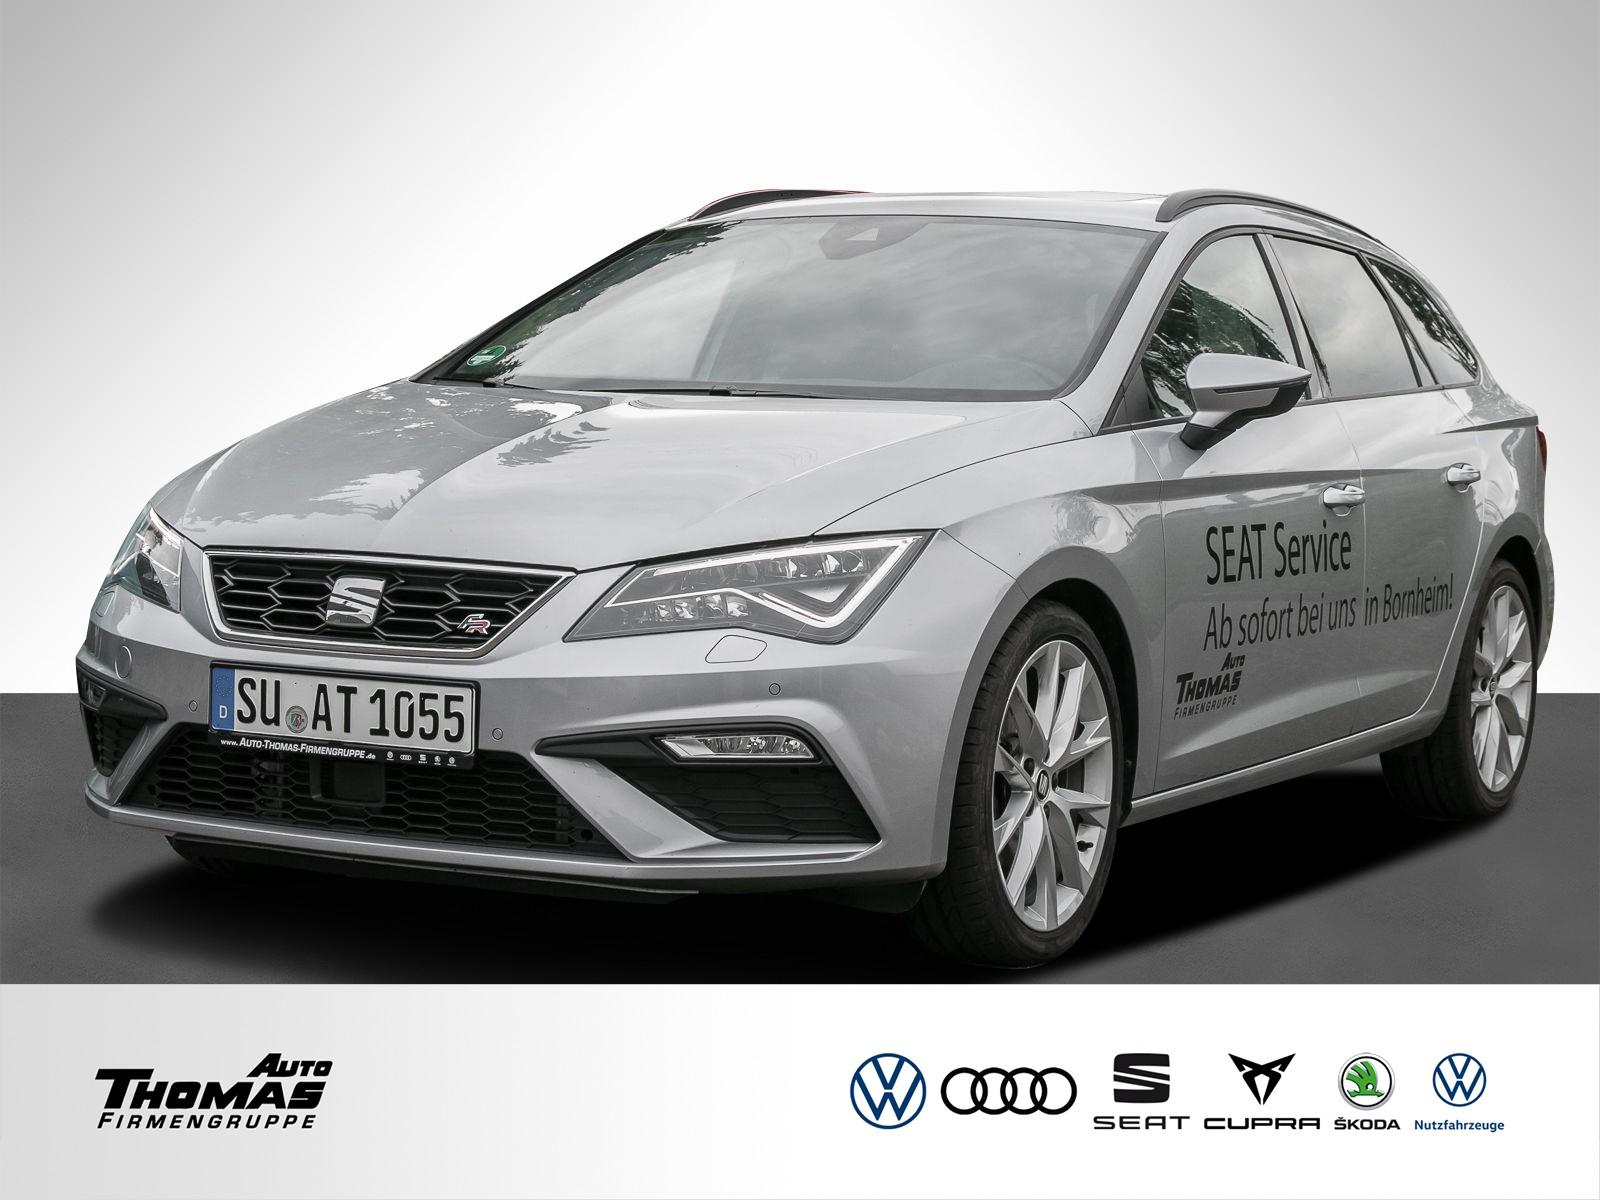 Seat Leon ST FR 1.5 TSI 110 kW (150 PS) 7-Gang-DSG, Jahr 2019, Benzin